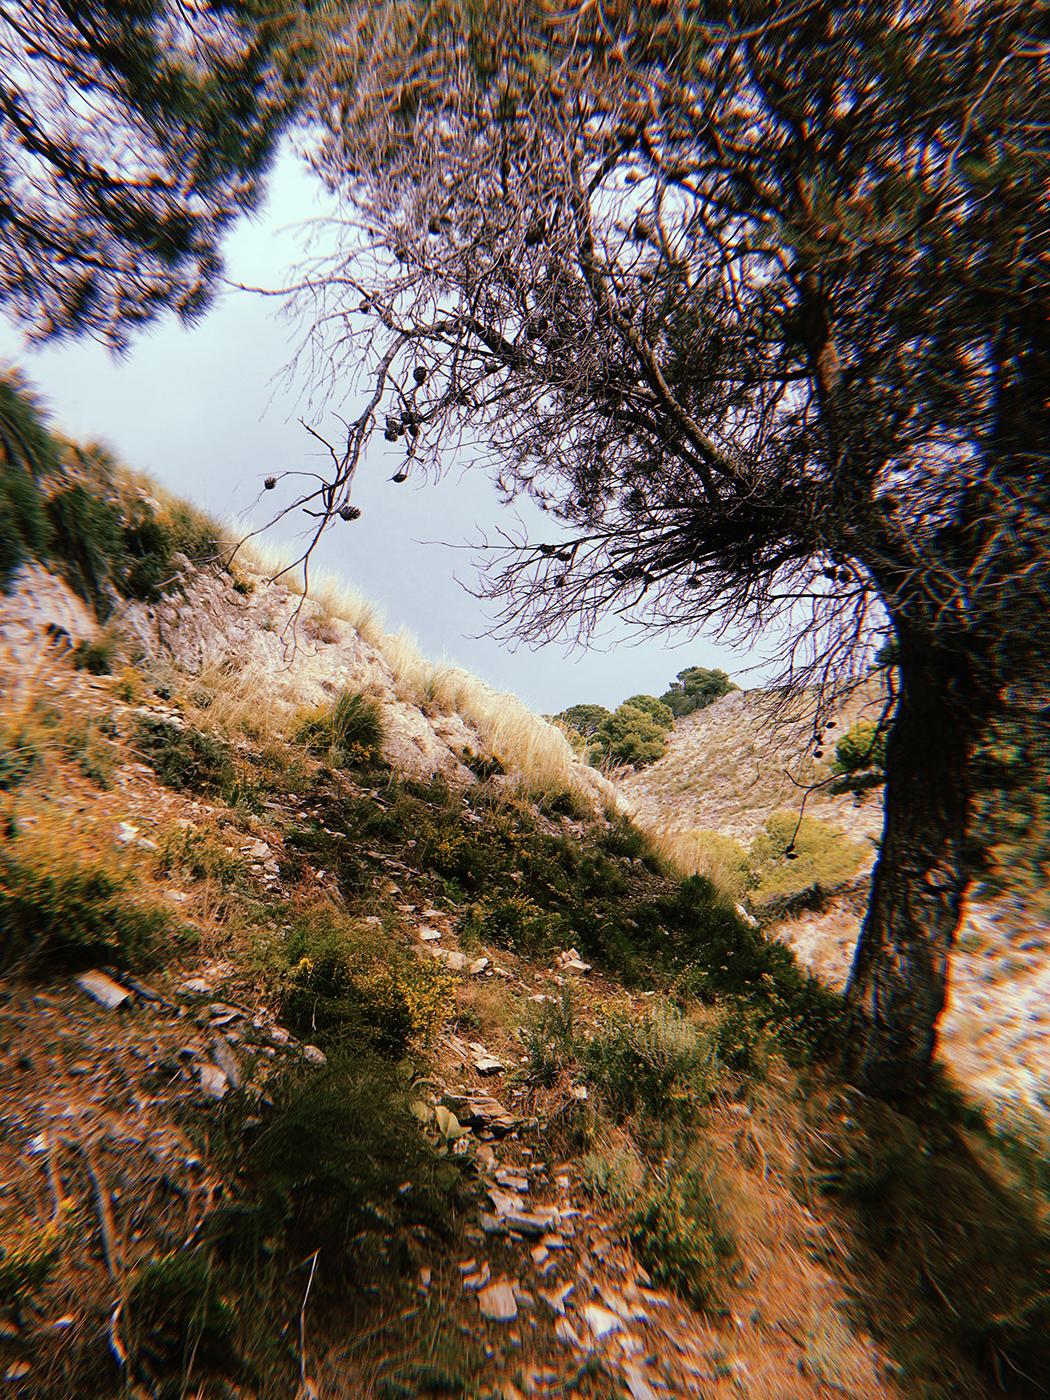 Malaga_007.jpg